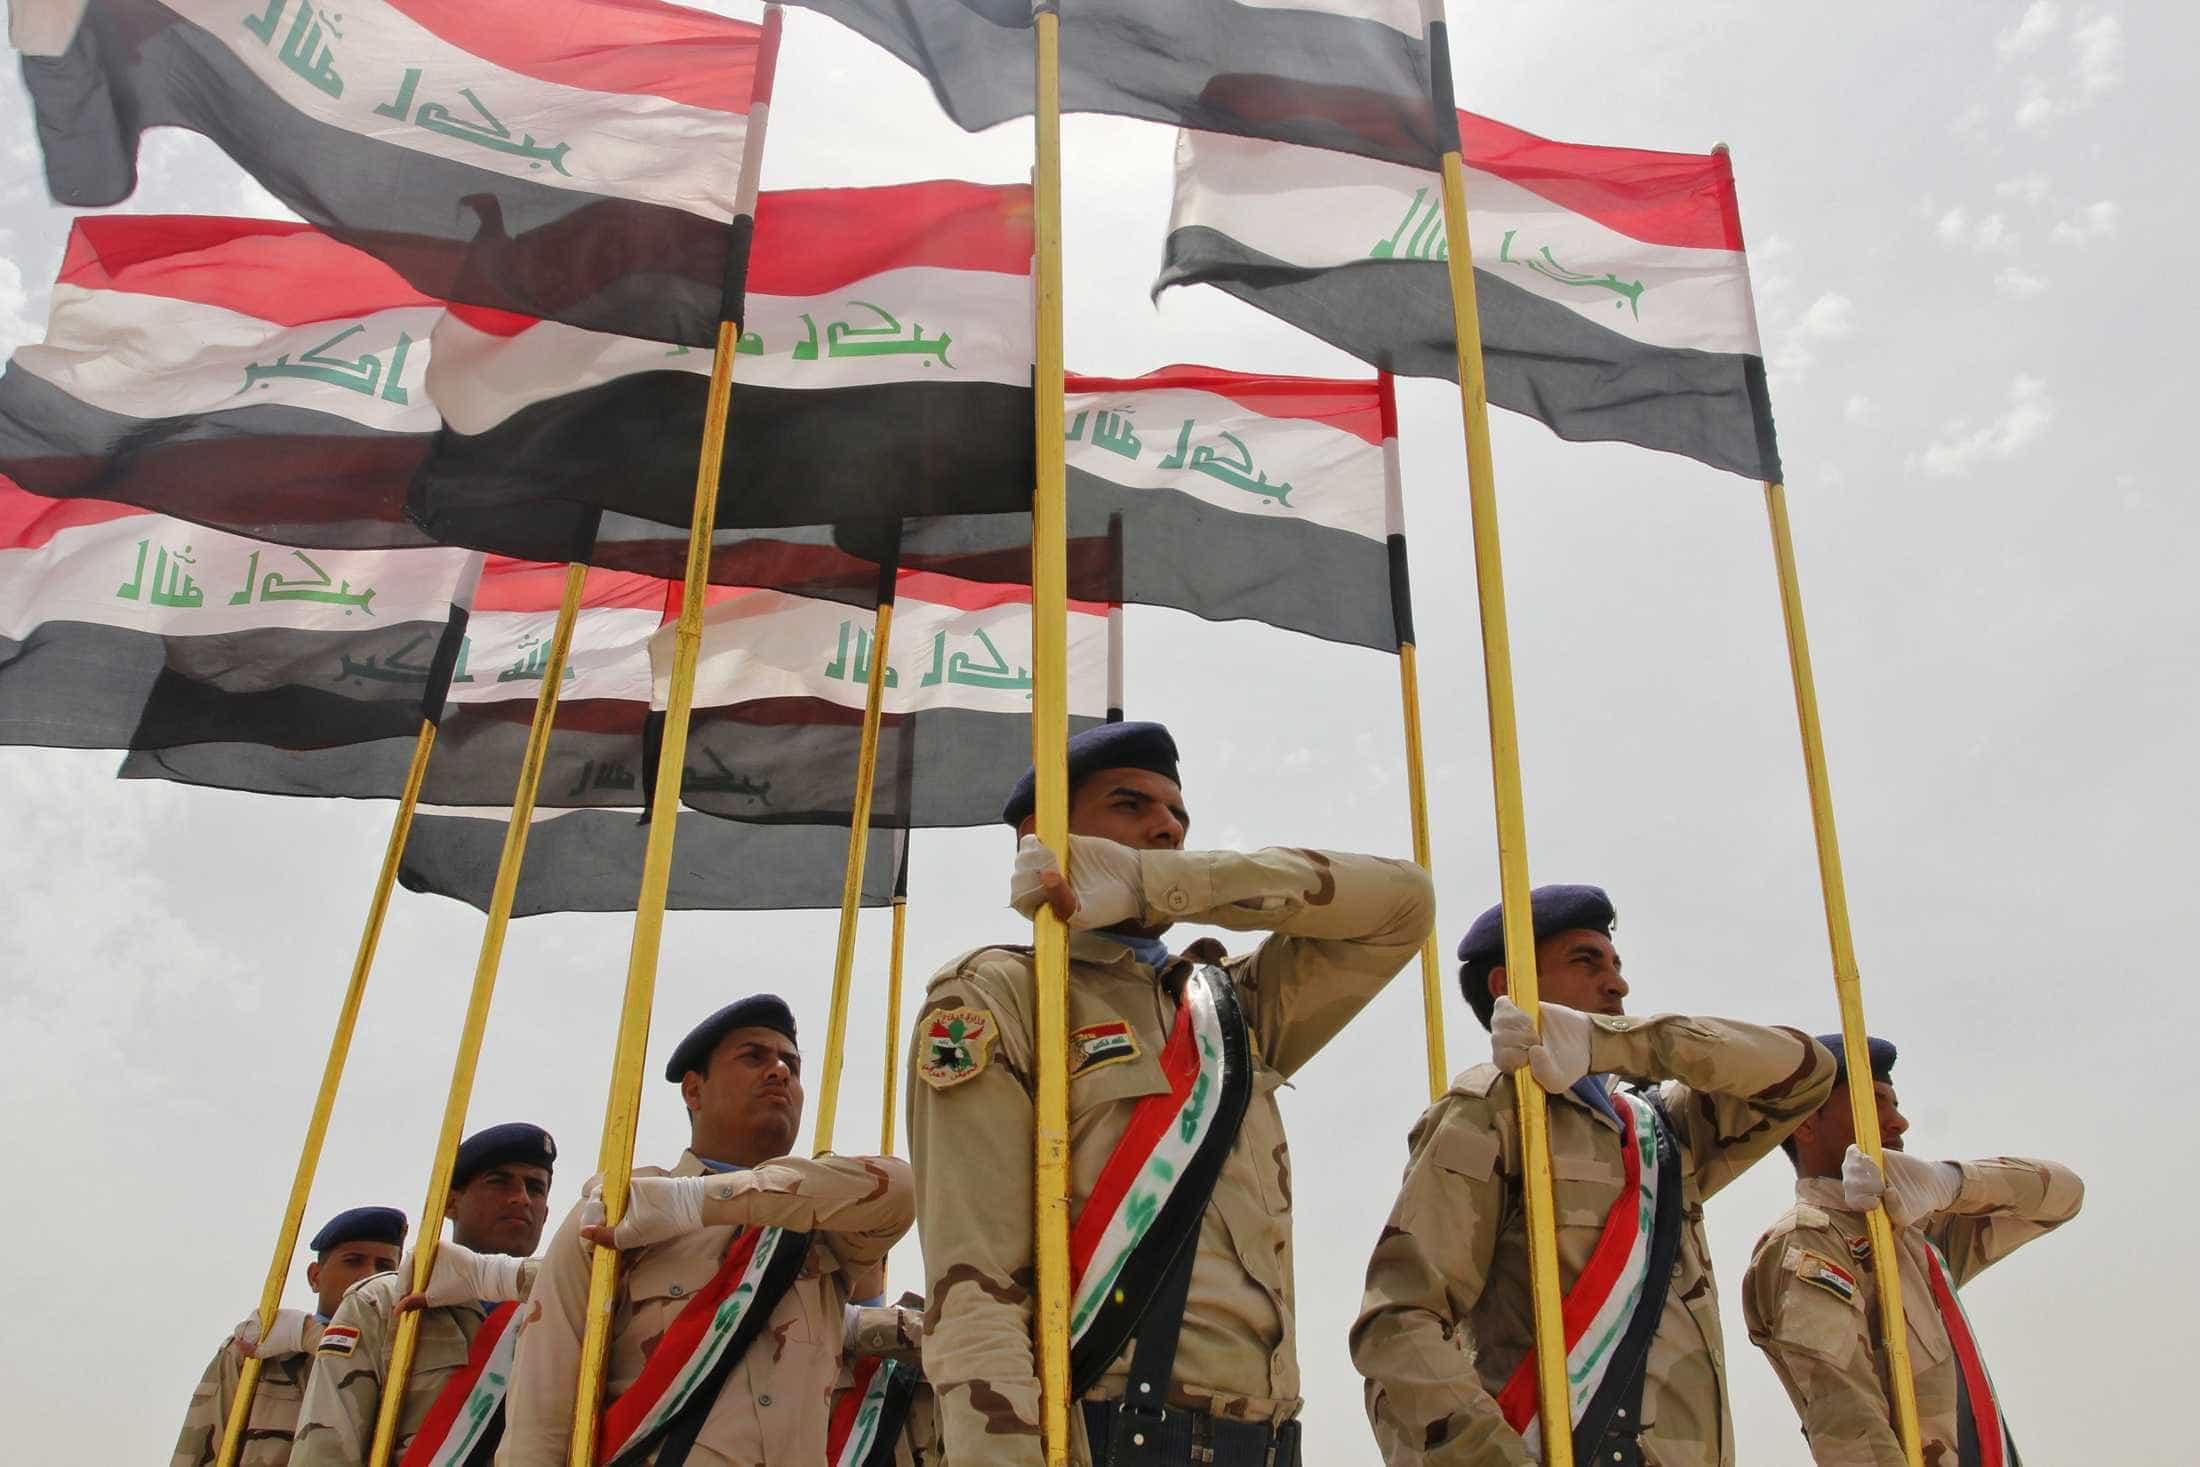 Iraque prepara-se para julgar 900 repatriados da Síria